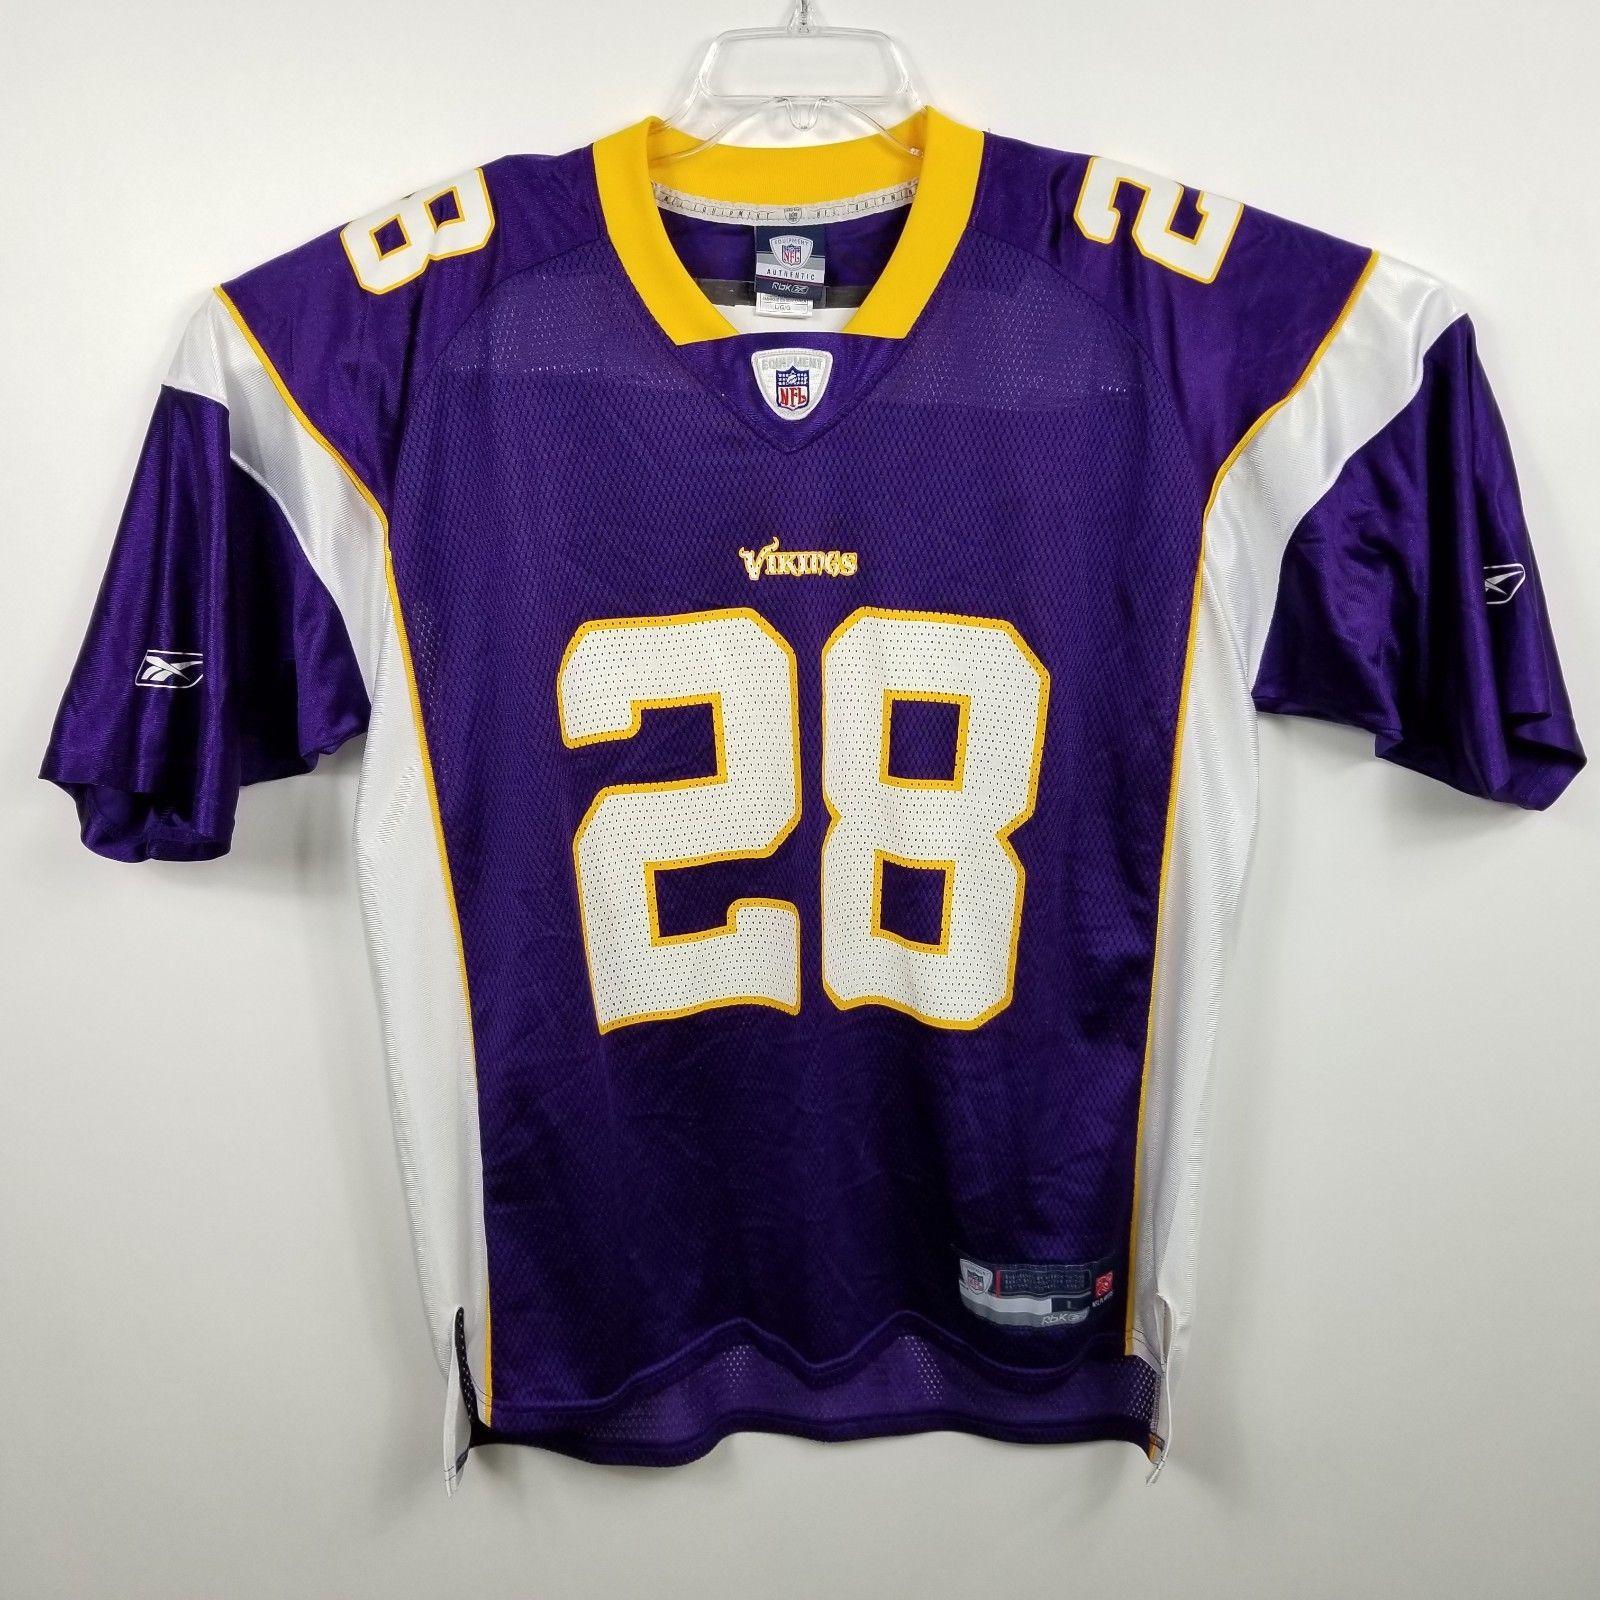 ac670c123 57. 57. Previous. Reebok Mens VTG Adrian Peterson Minnesota Vikings Jersey  Sz L Large Purple 28